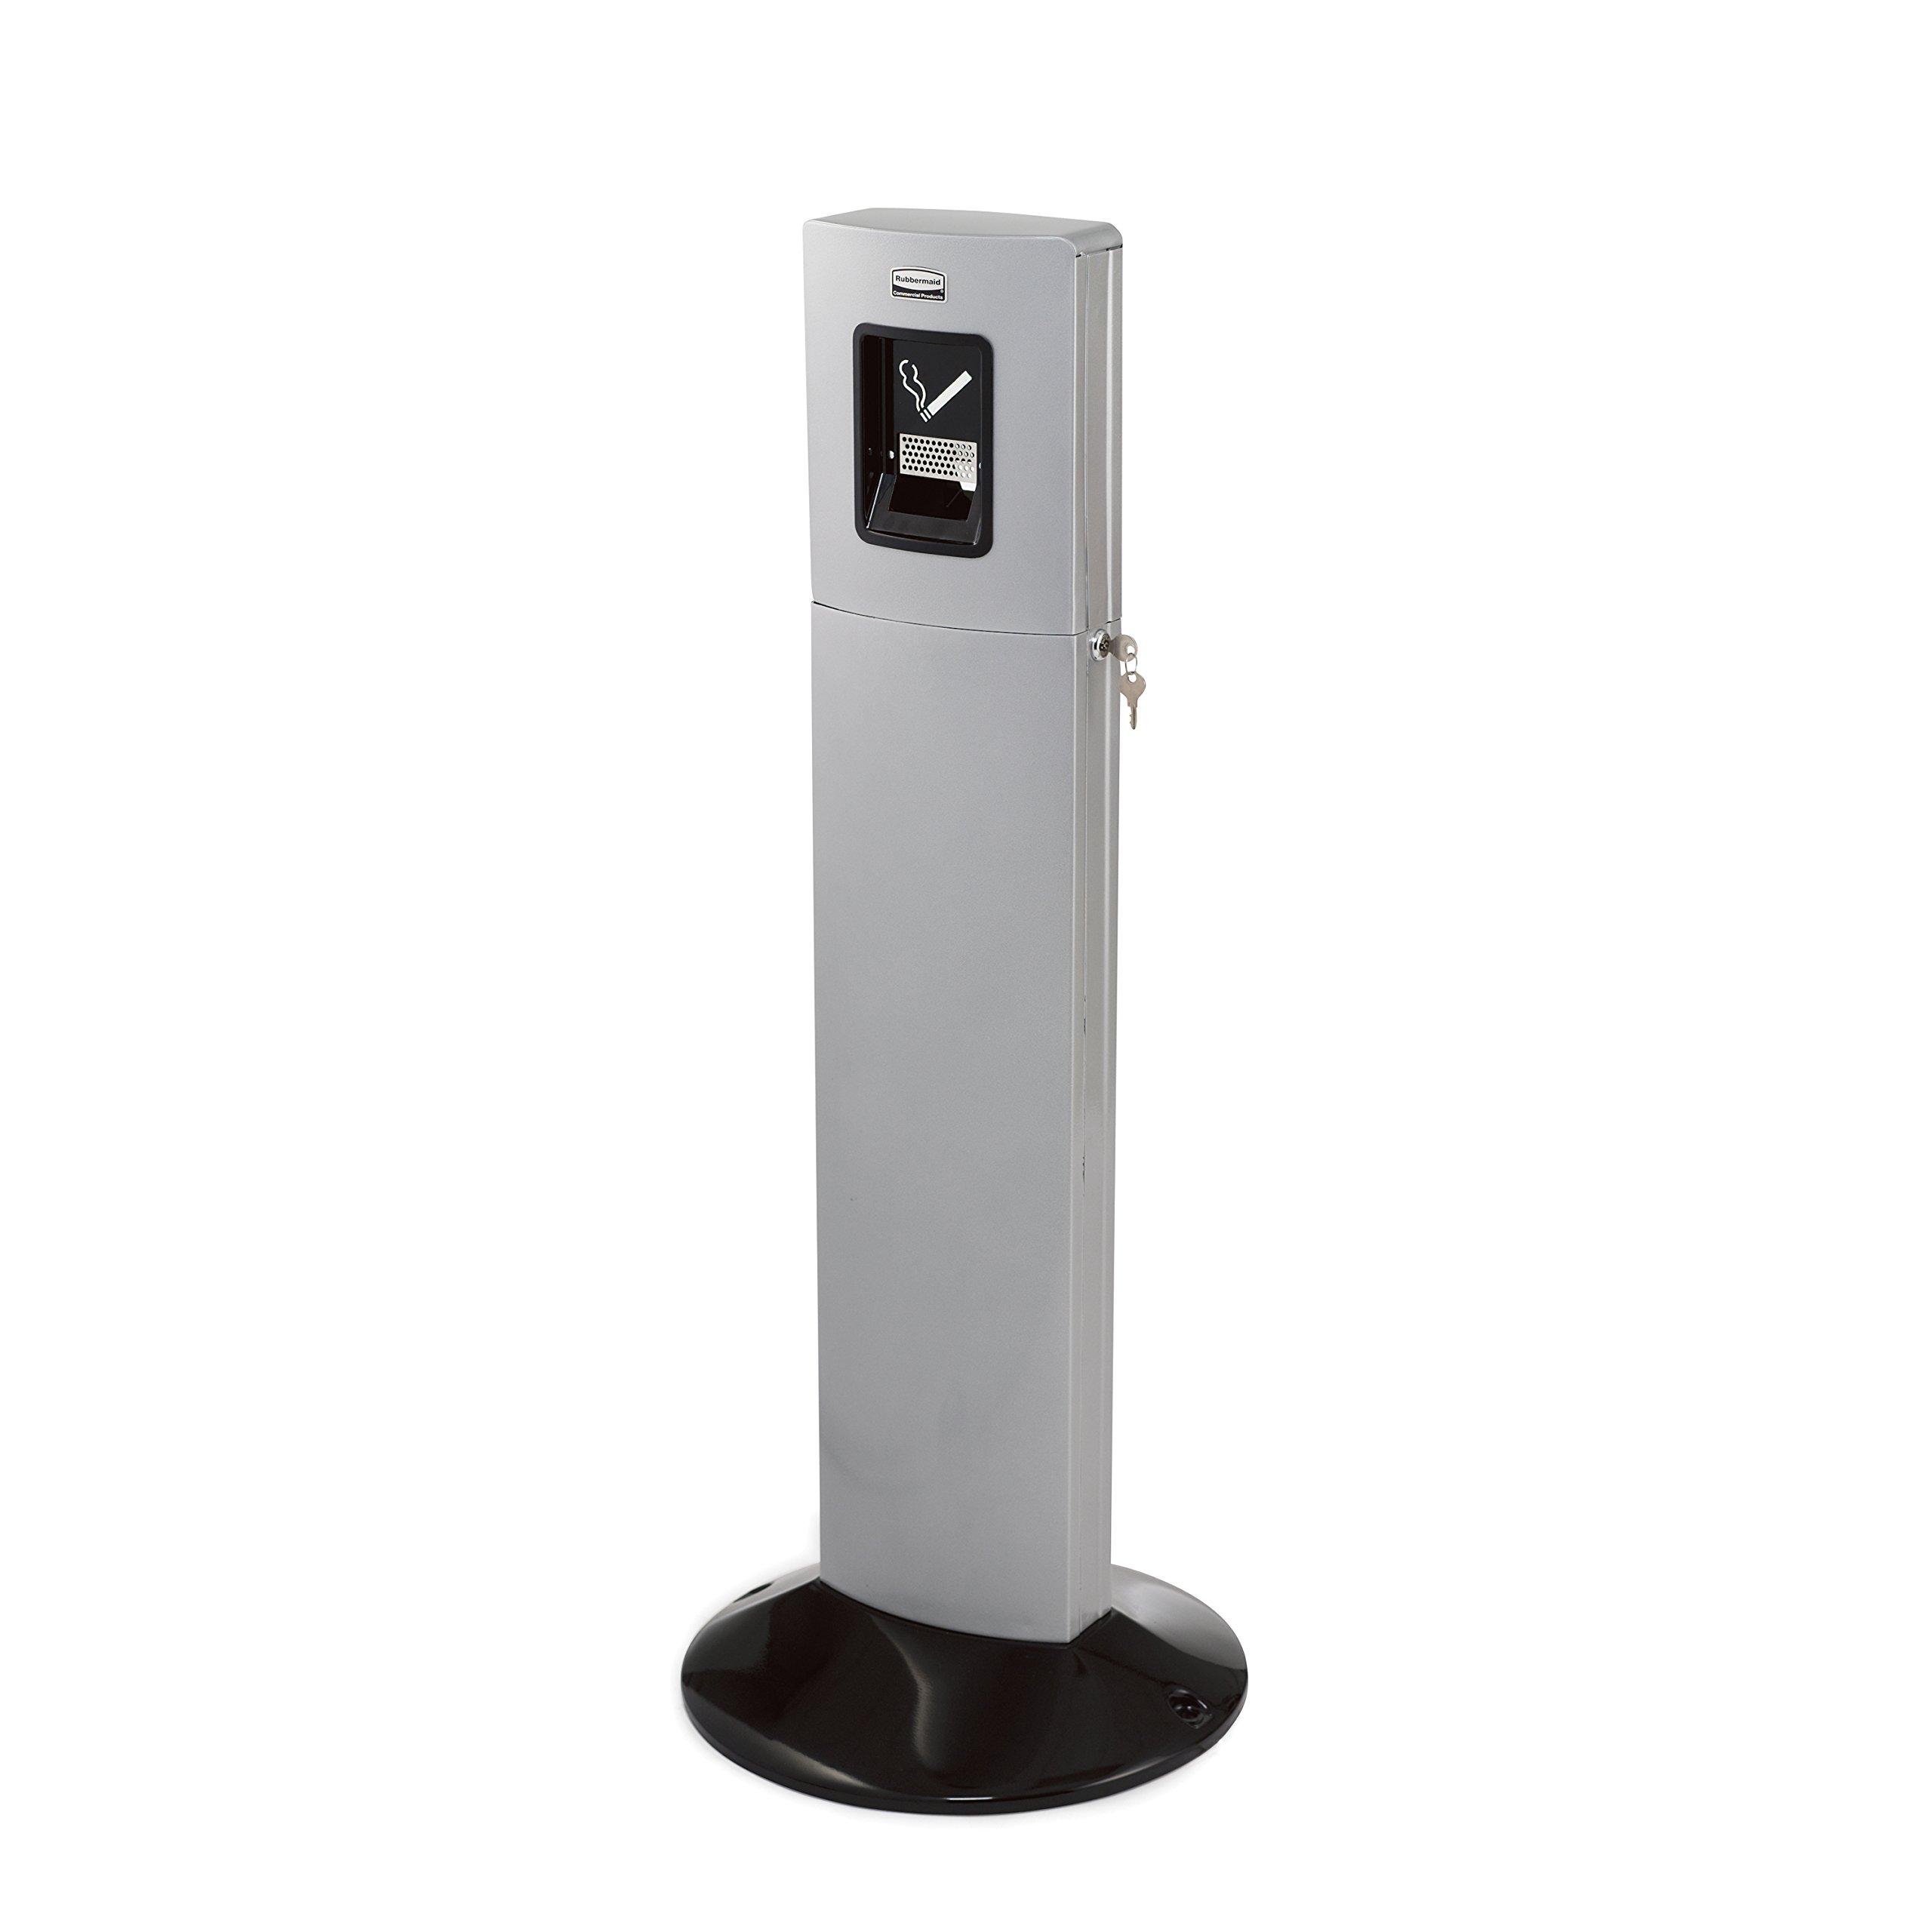 Rubbermaid Commercial Metropolitan Smokers Station, 1-3/5 Gallon, Silver Metallic, FGR93400SM